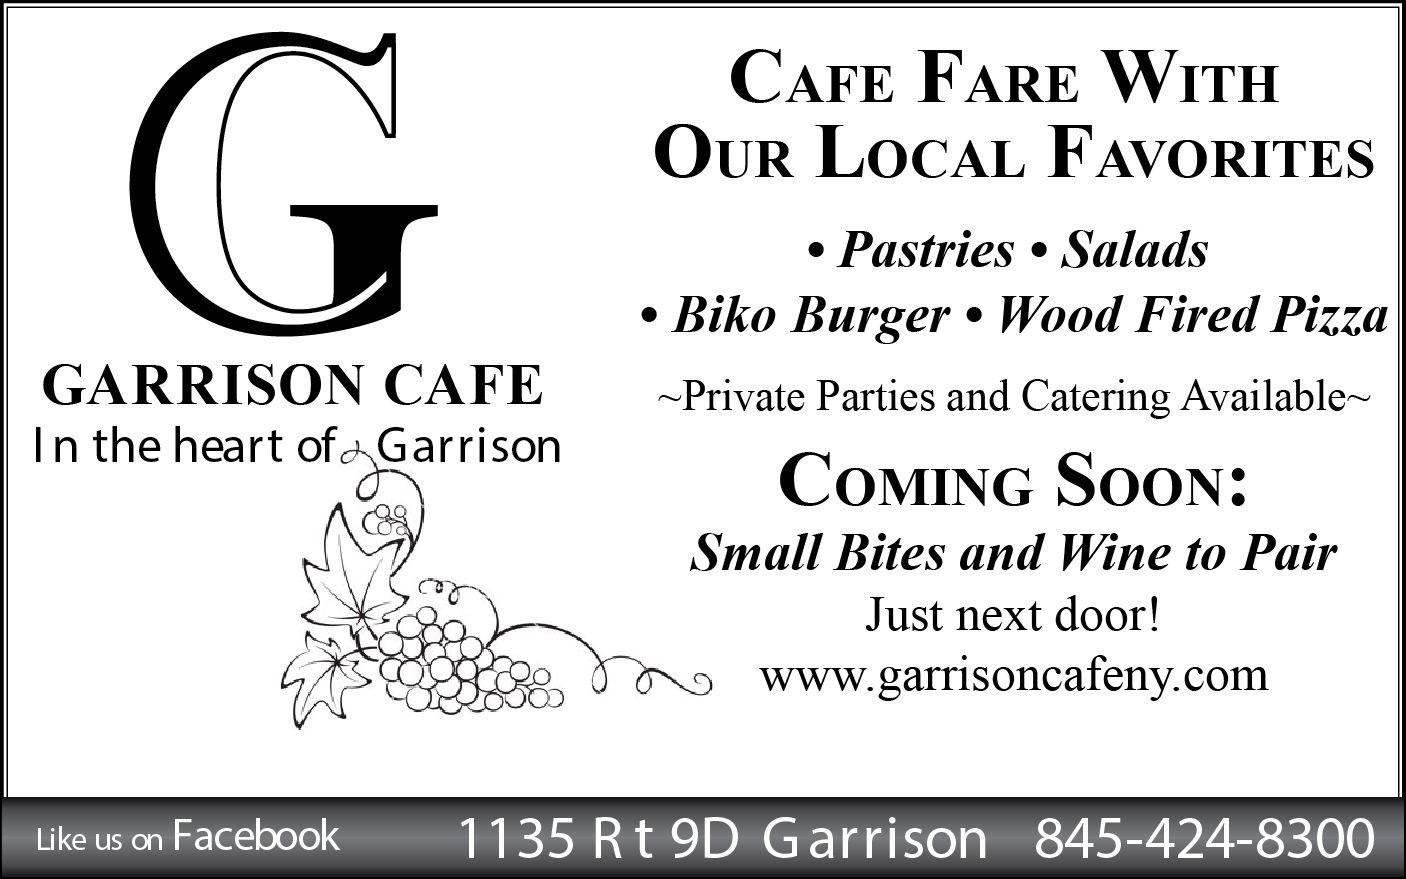 Garrison Cafe